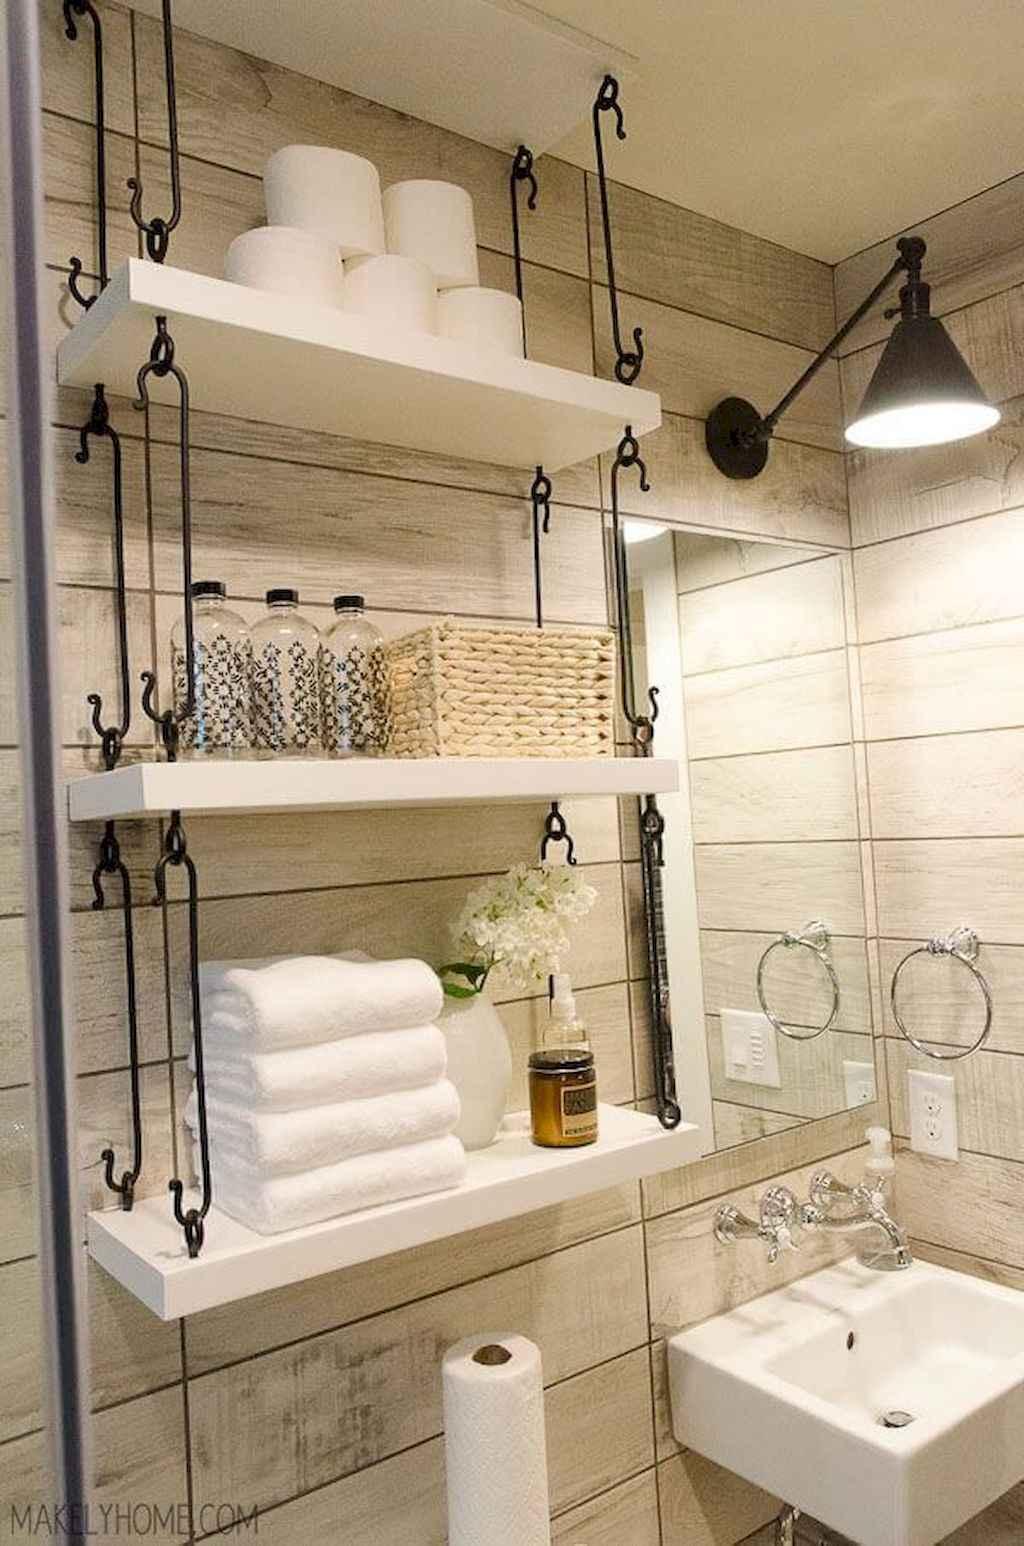 111 Brilliant Small Bathroom Remodel Ideas On A Budget (94)